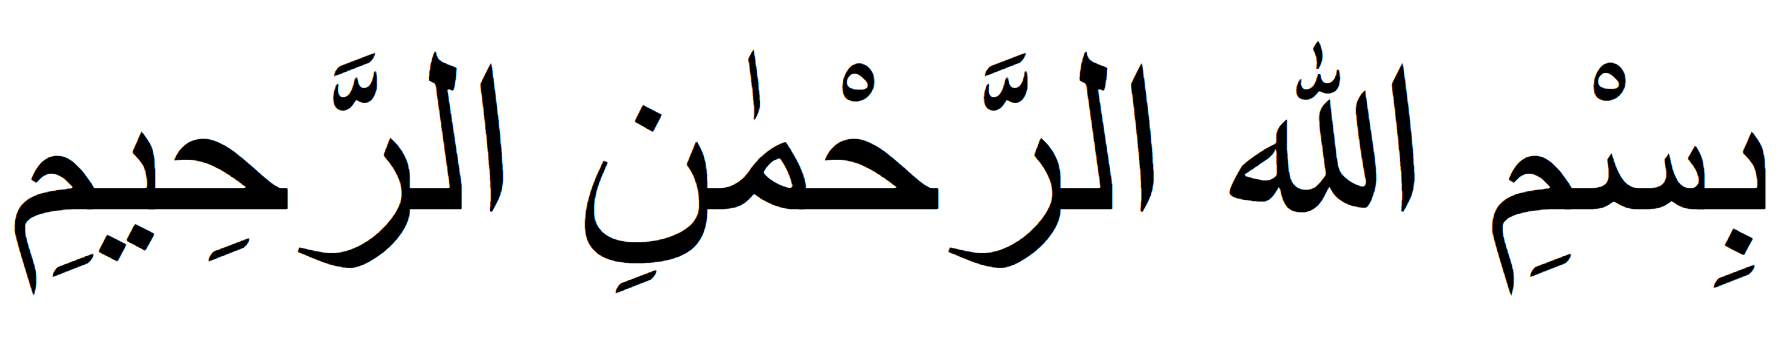 8cfe176a3 Let's take the following arabic sentence: بِسْمِ الله الرَّحْمٰنِ الرَّحِيمِ'  Natively it renders to the following form: